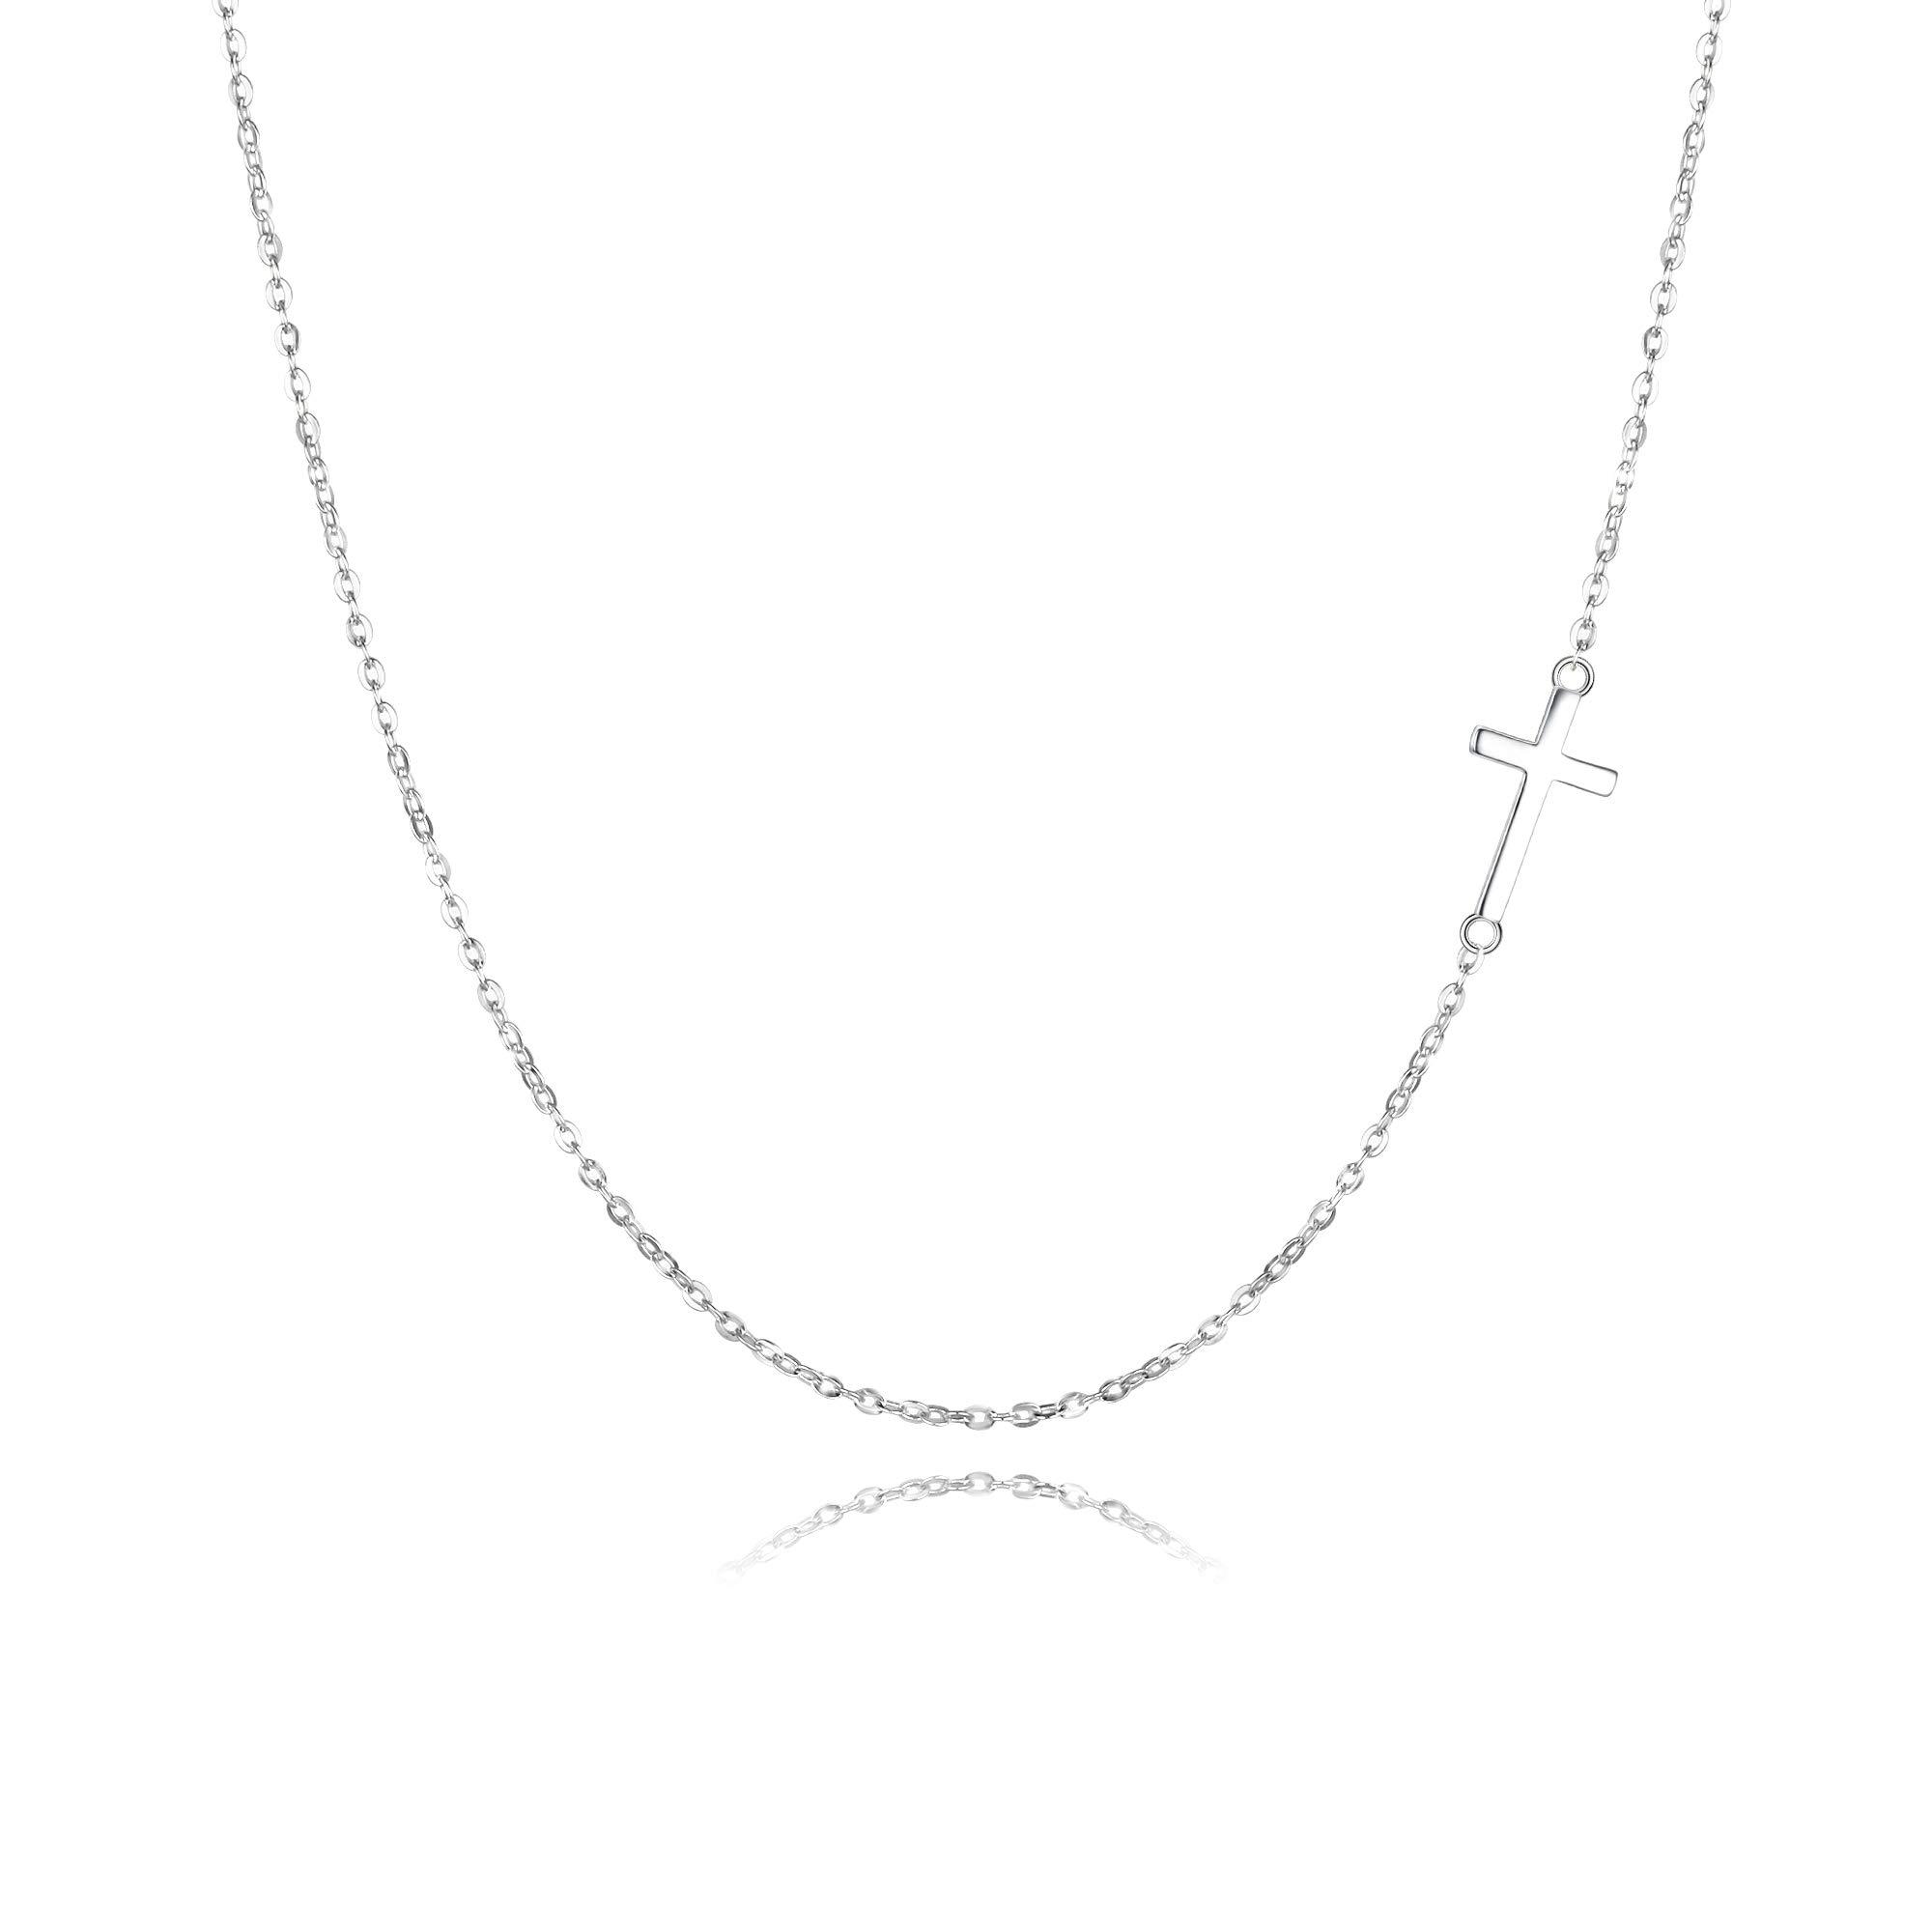 EVER FAITH 925 Sterling Silver Simple Church Sideways Cross Pendant Choker Necklace for Women, Girls